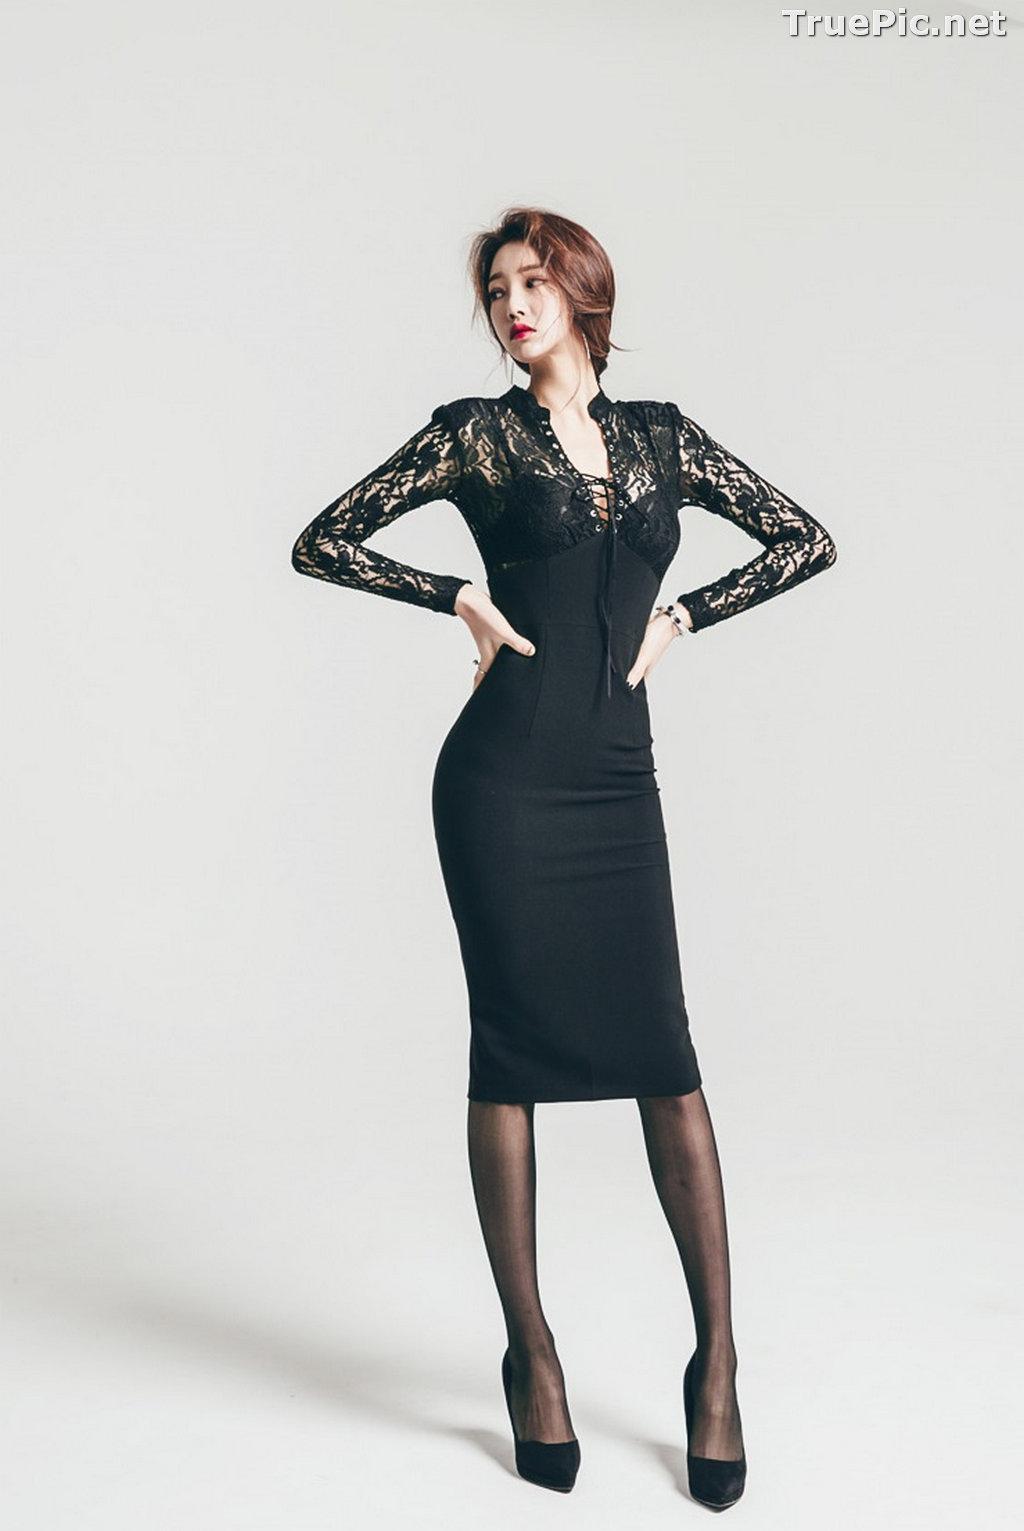 Image Korean Beautiful Model – Park Jung Yoon – Fashion Photography #11 - TruePic.net - Picture-62